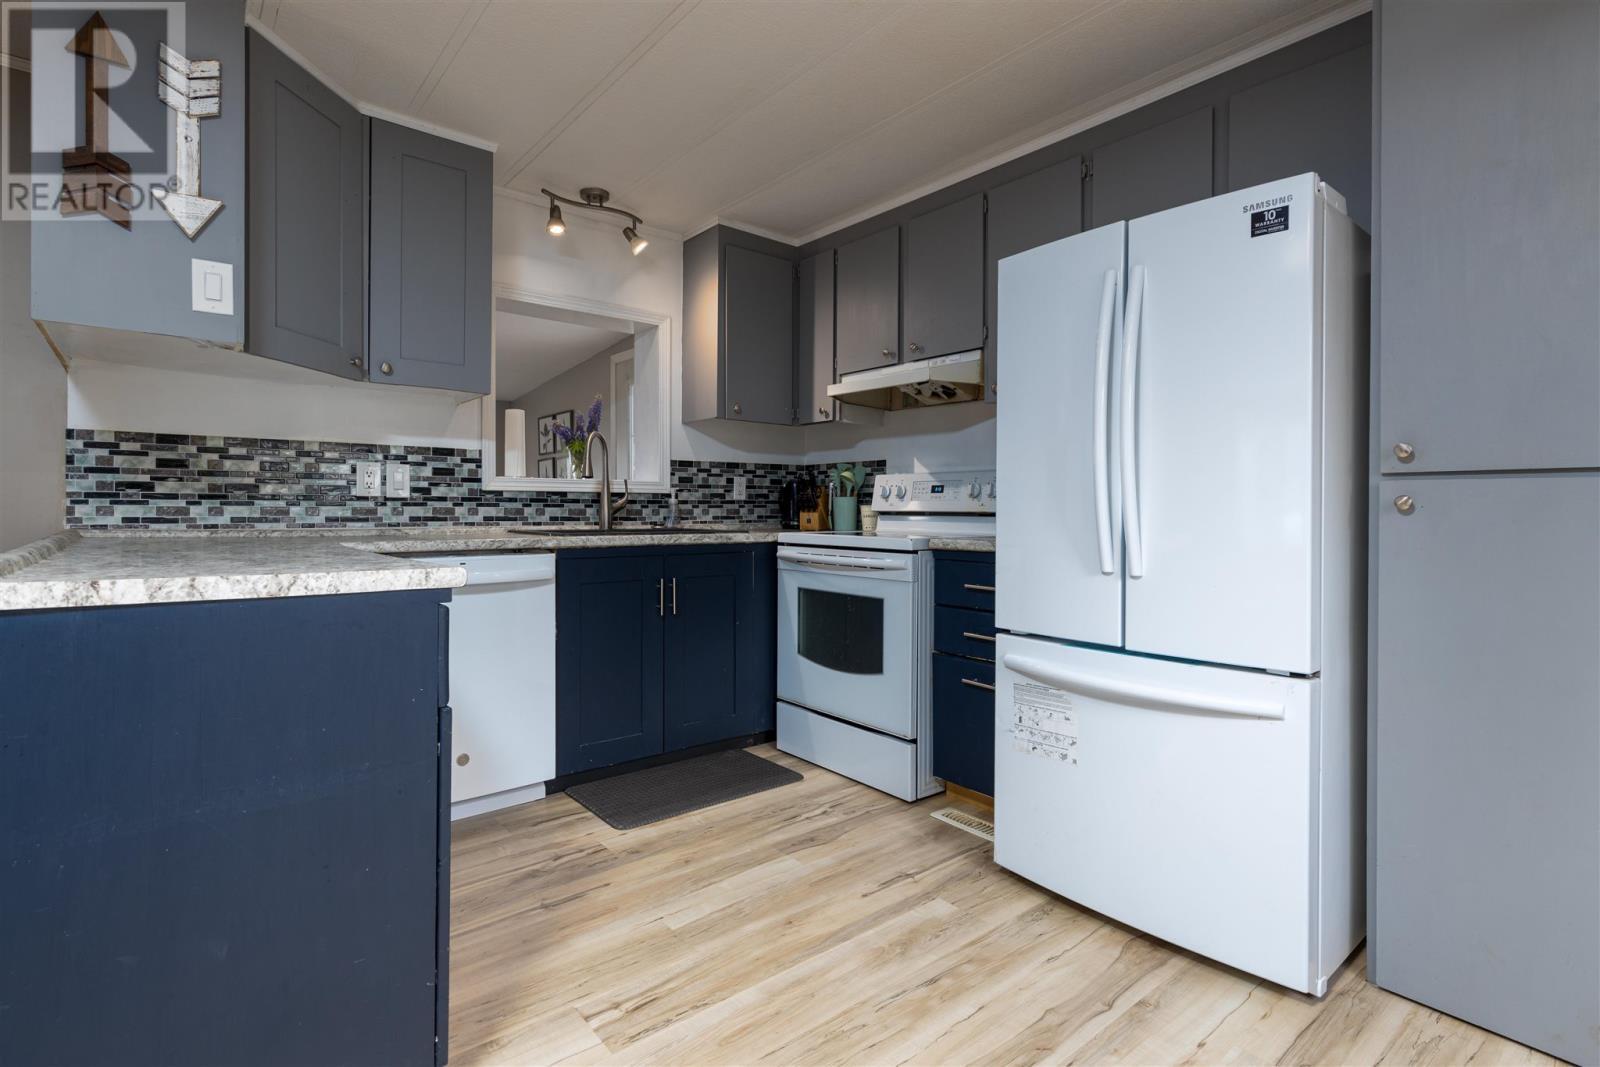 52 3616 Larch Avenue, Terrace, British Columbia  V8G 5B9 - Photo 5 - R2594554